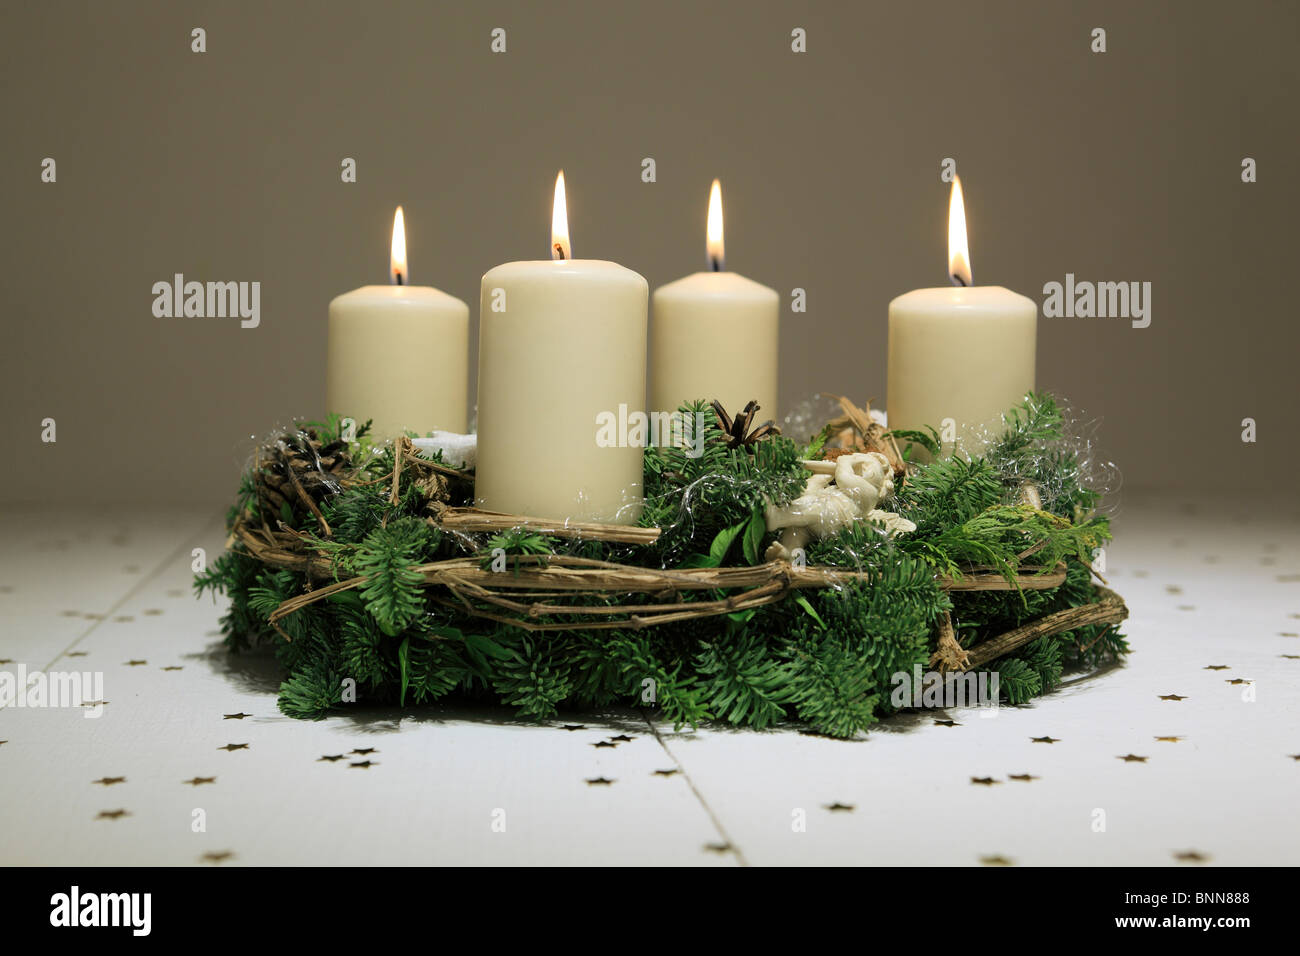 4 Advent Advent Wreath Advent Time Deko Decoration Adornment Angel Stock Photo Alamy